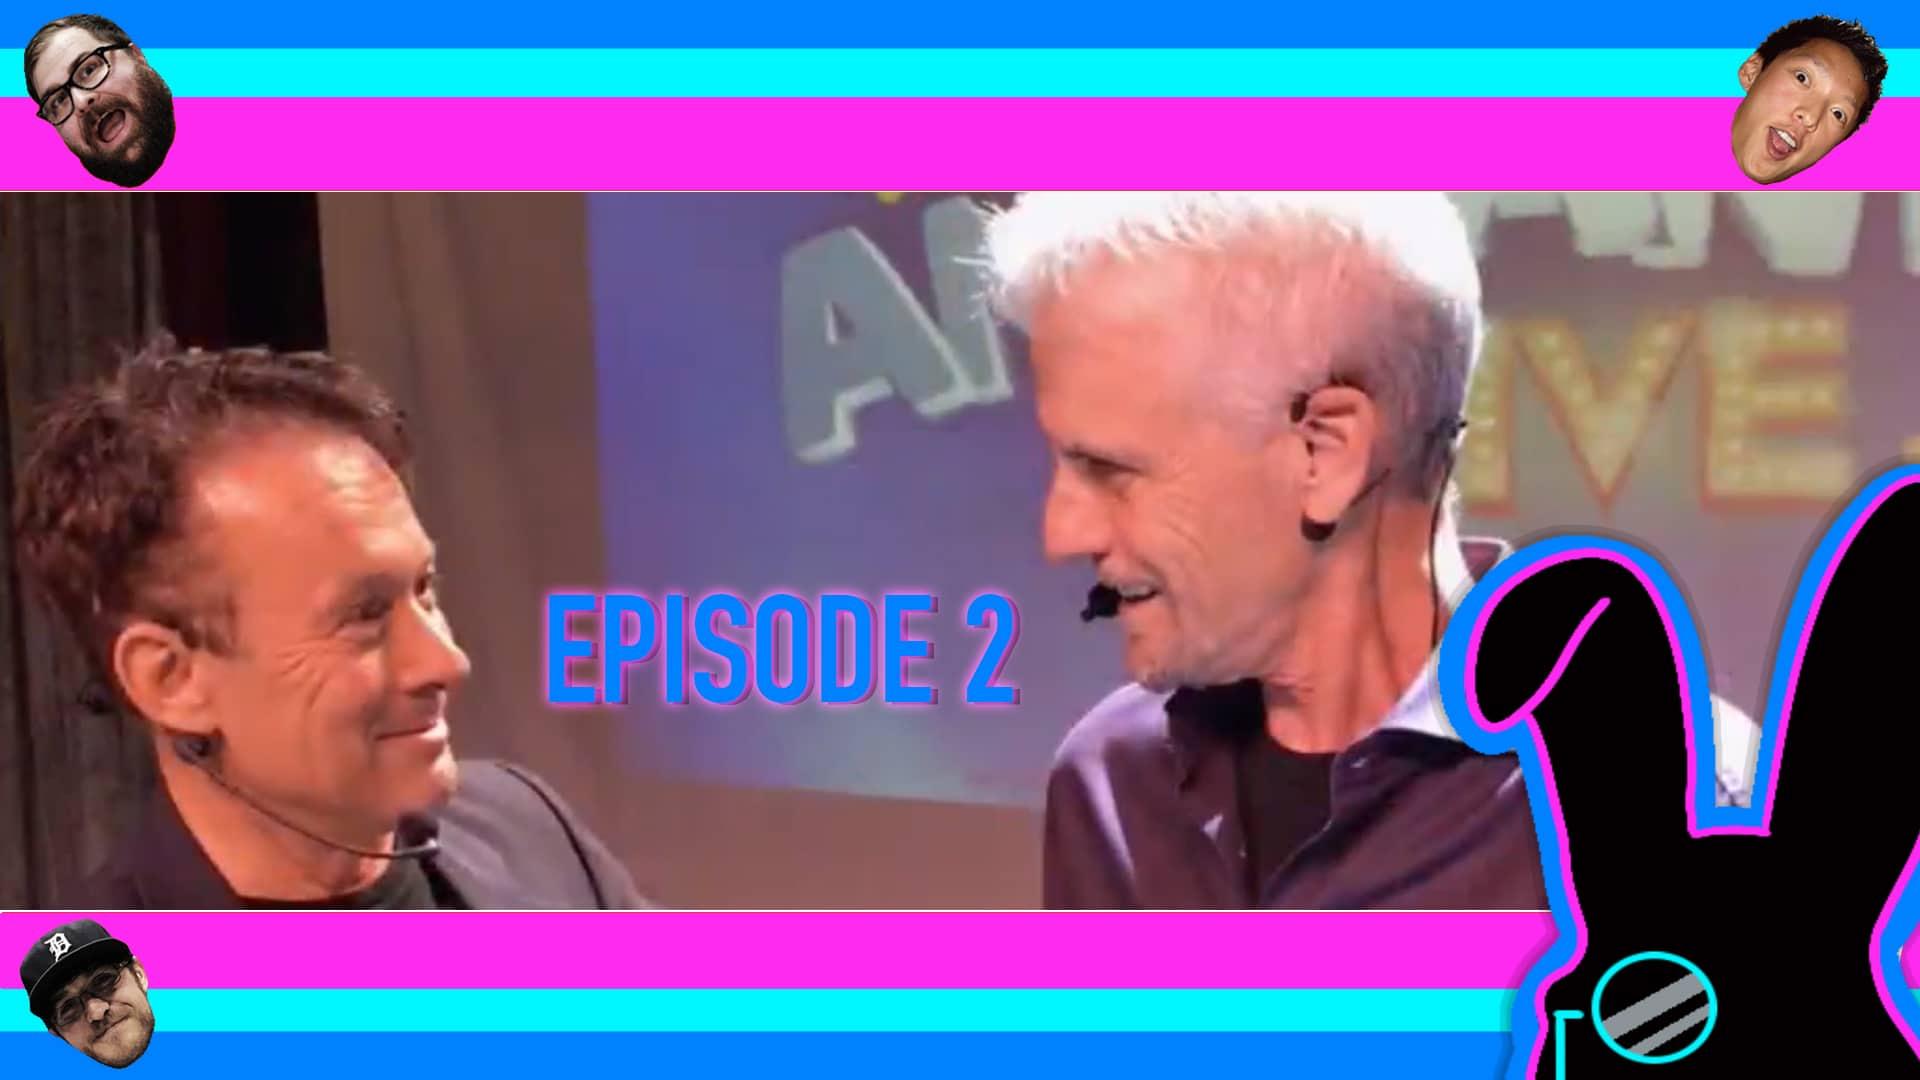 Geektainment Weekly - Episode 2